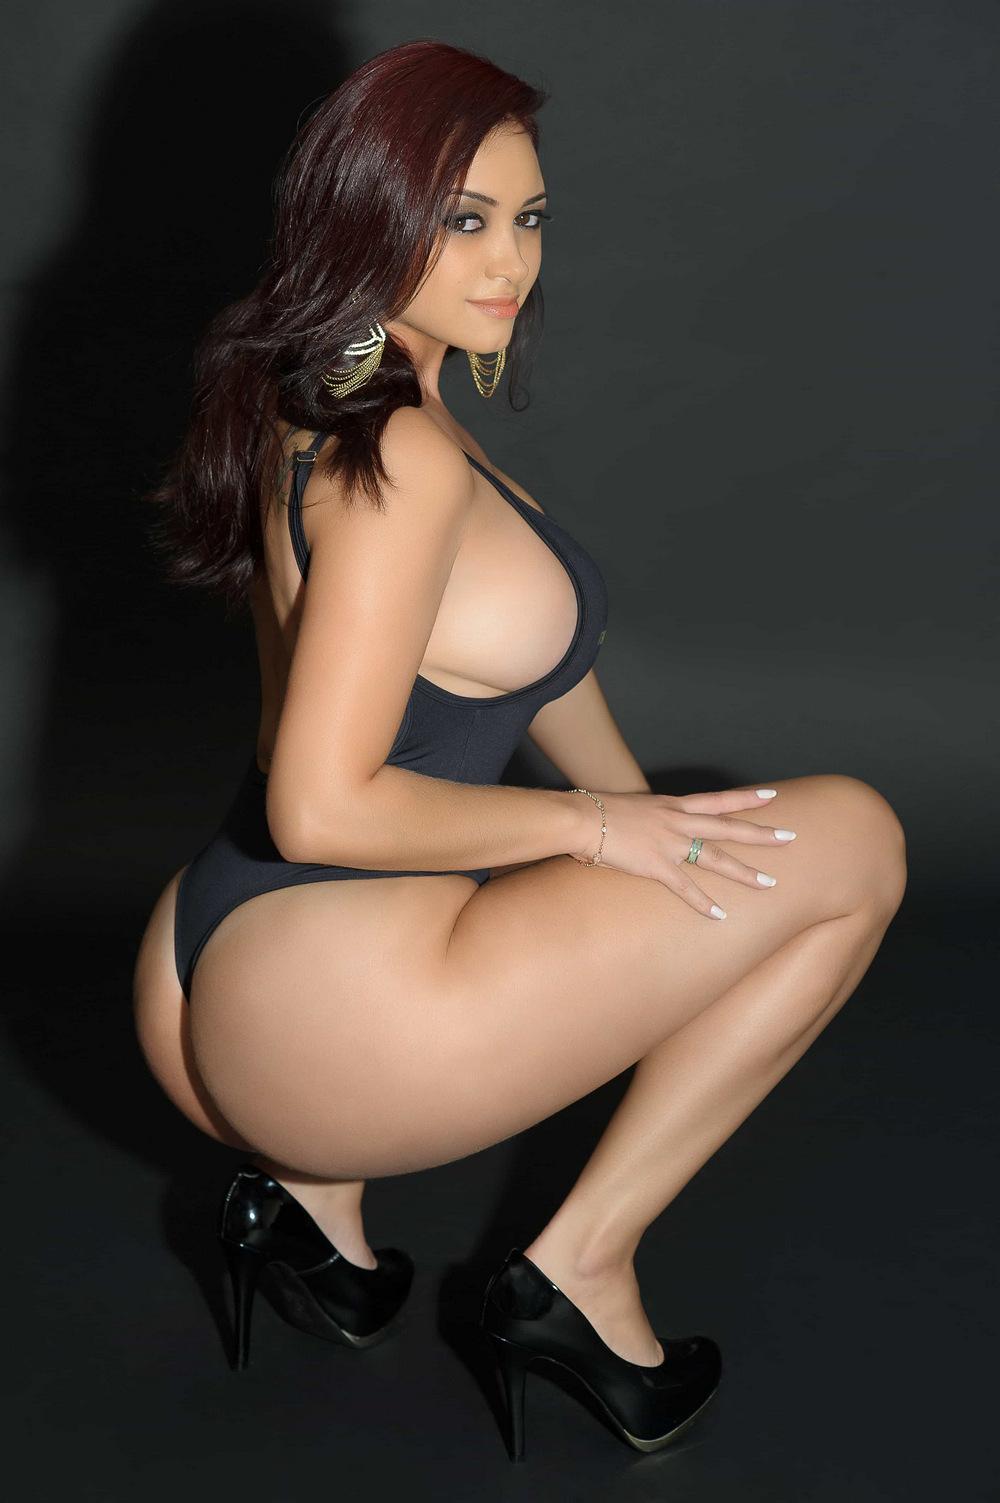 Самая сексуальная бразильская попа